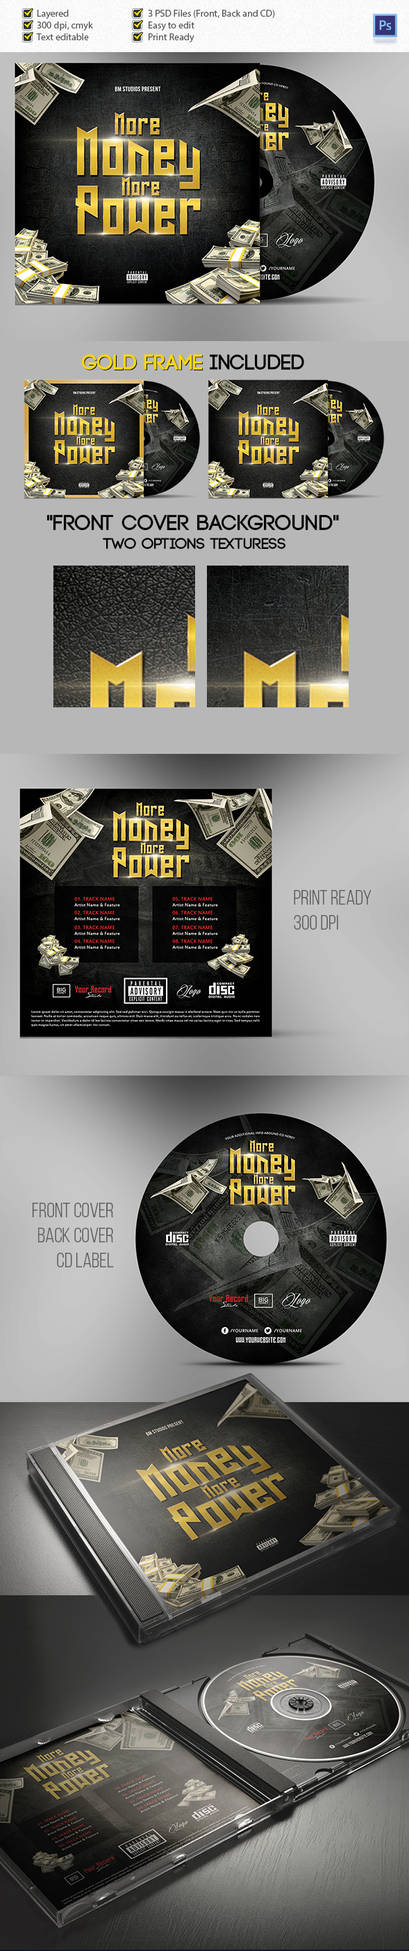 DVD Cover Art More Money More Power